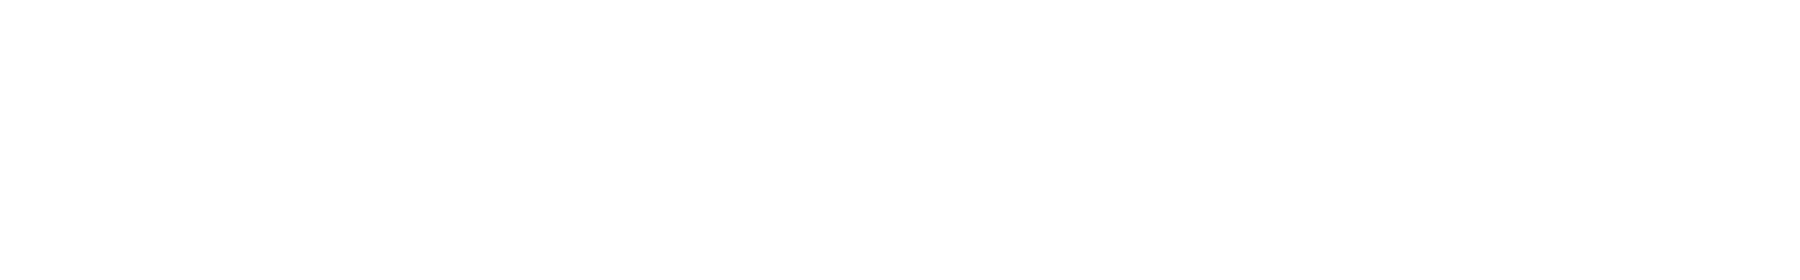 006 female